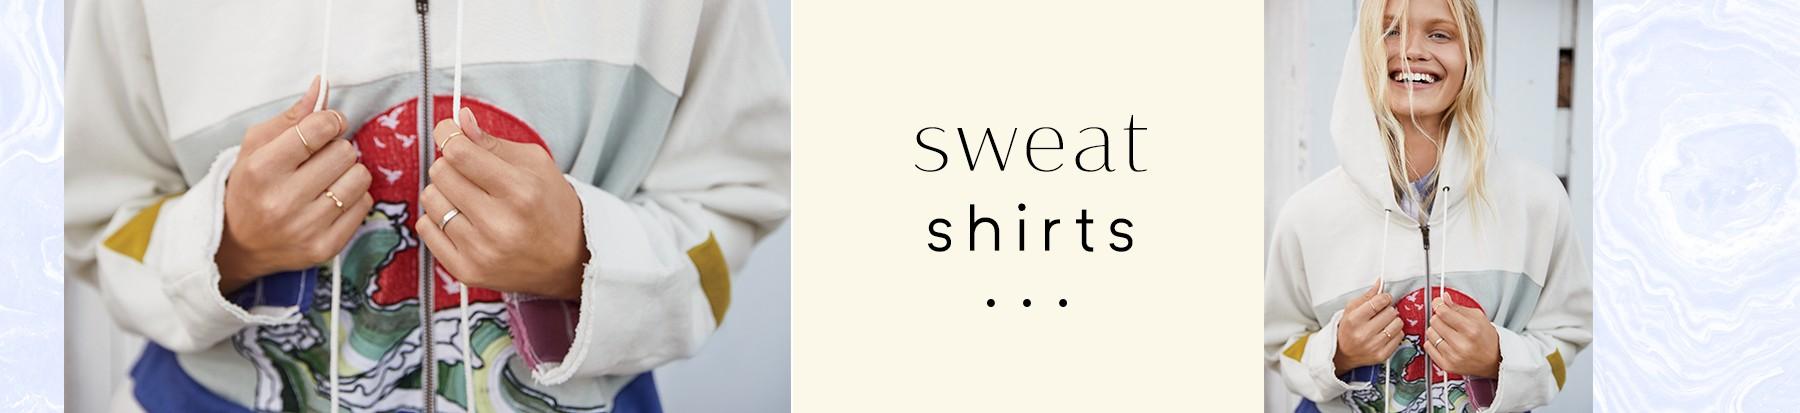 Lace Sweatshirt